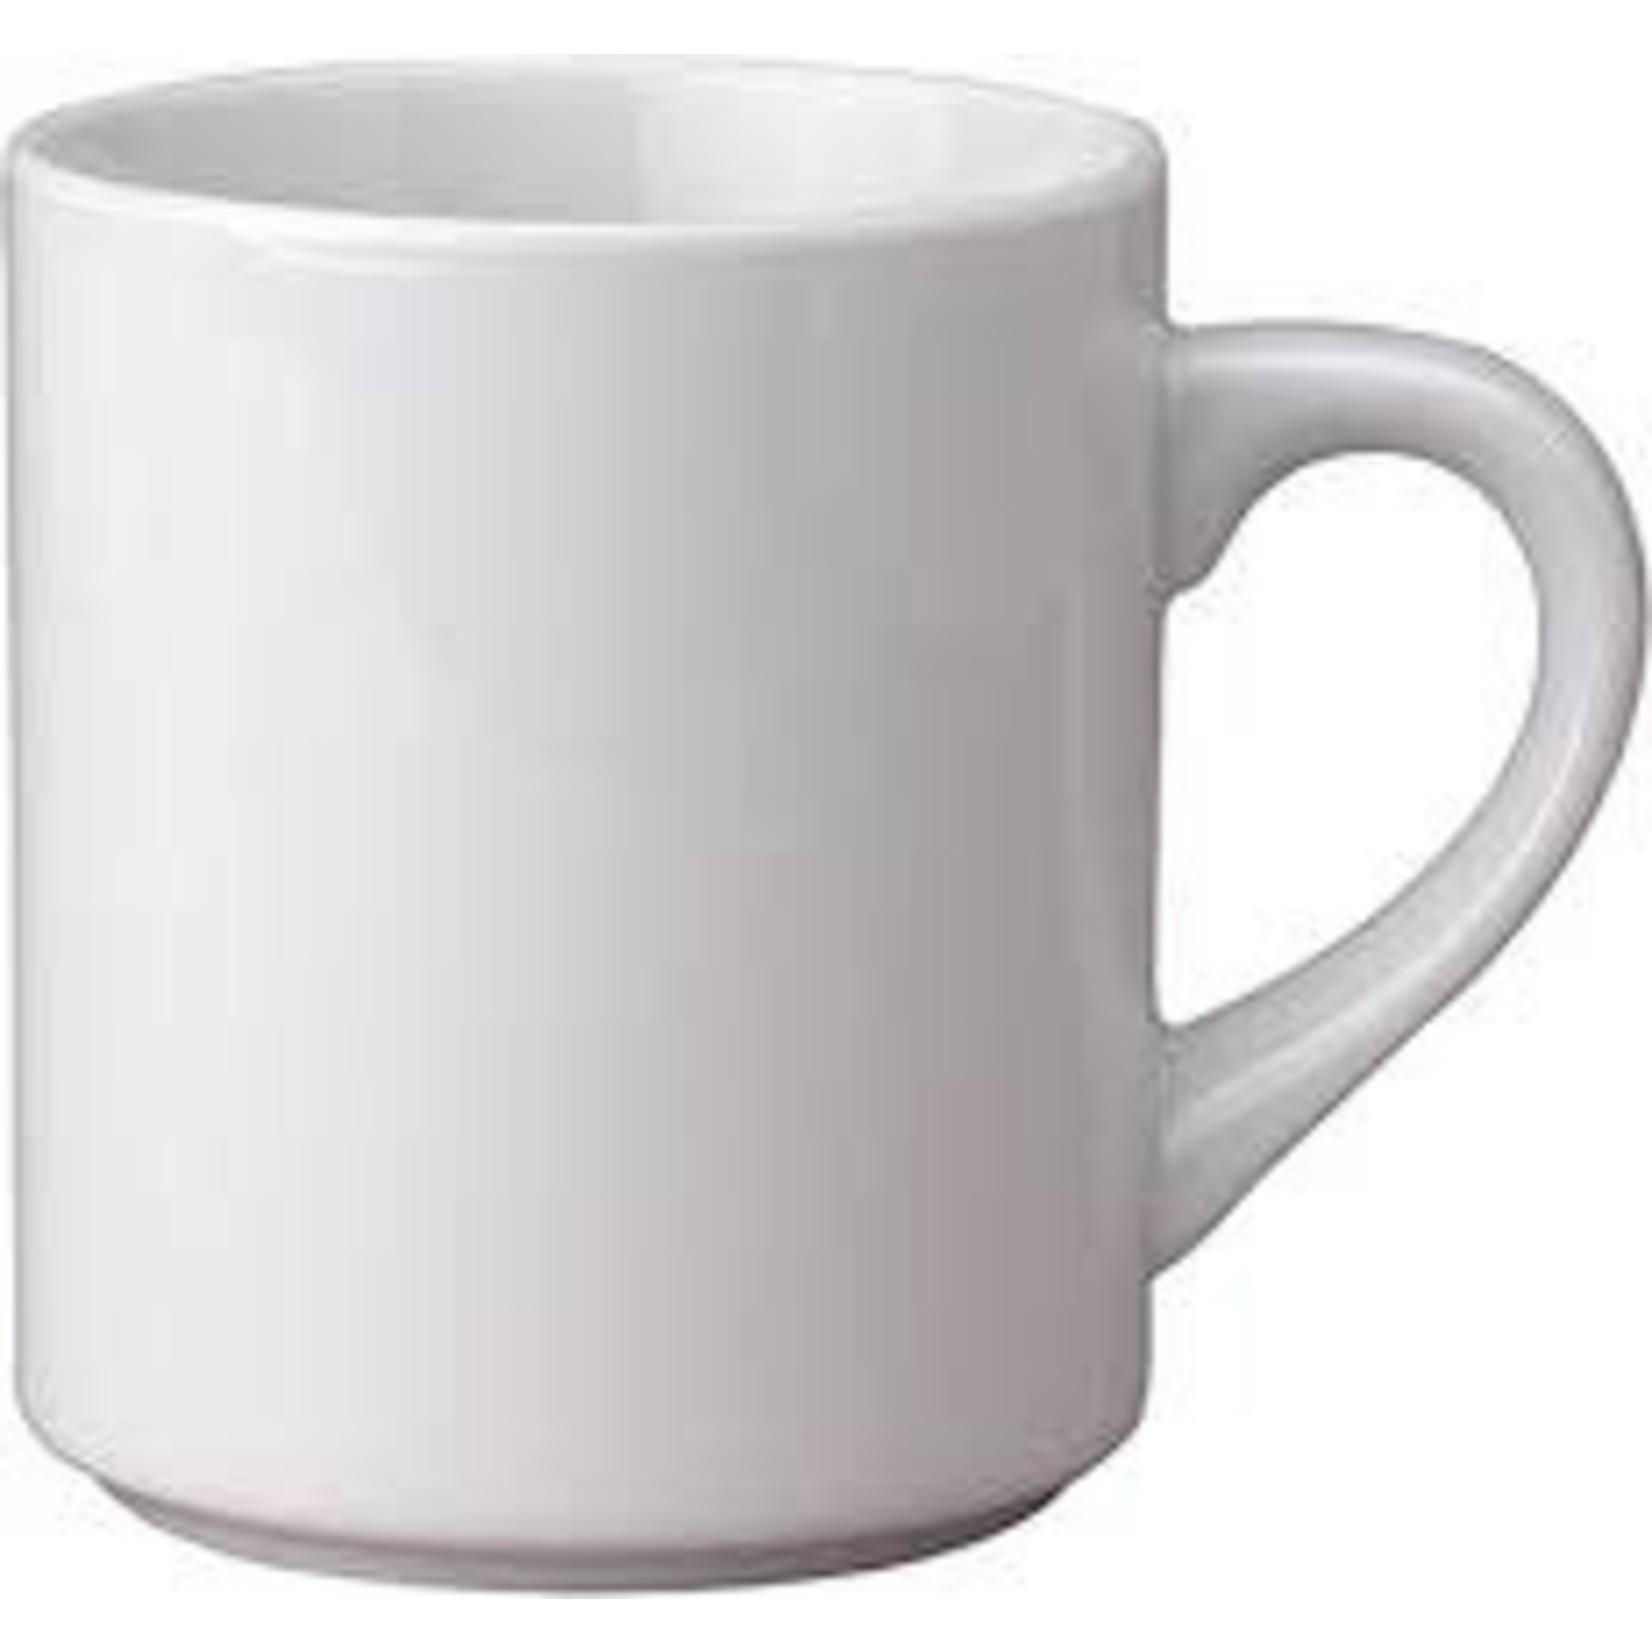 10 Oz White Mug